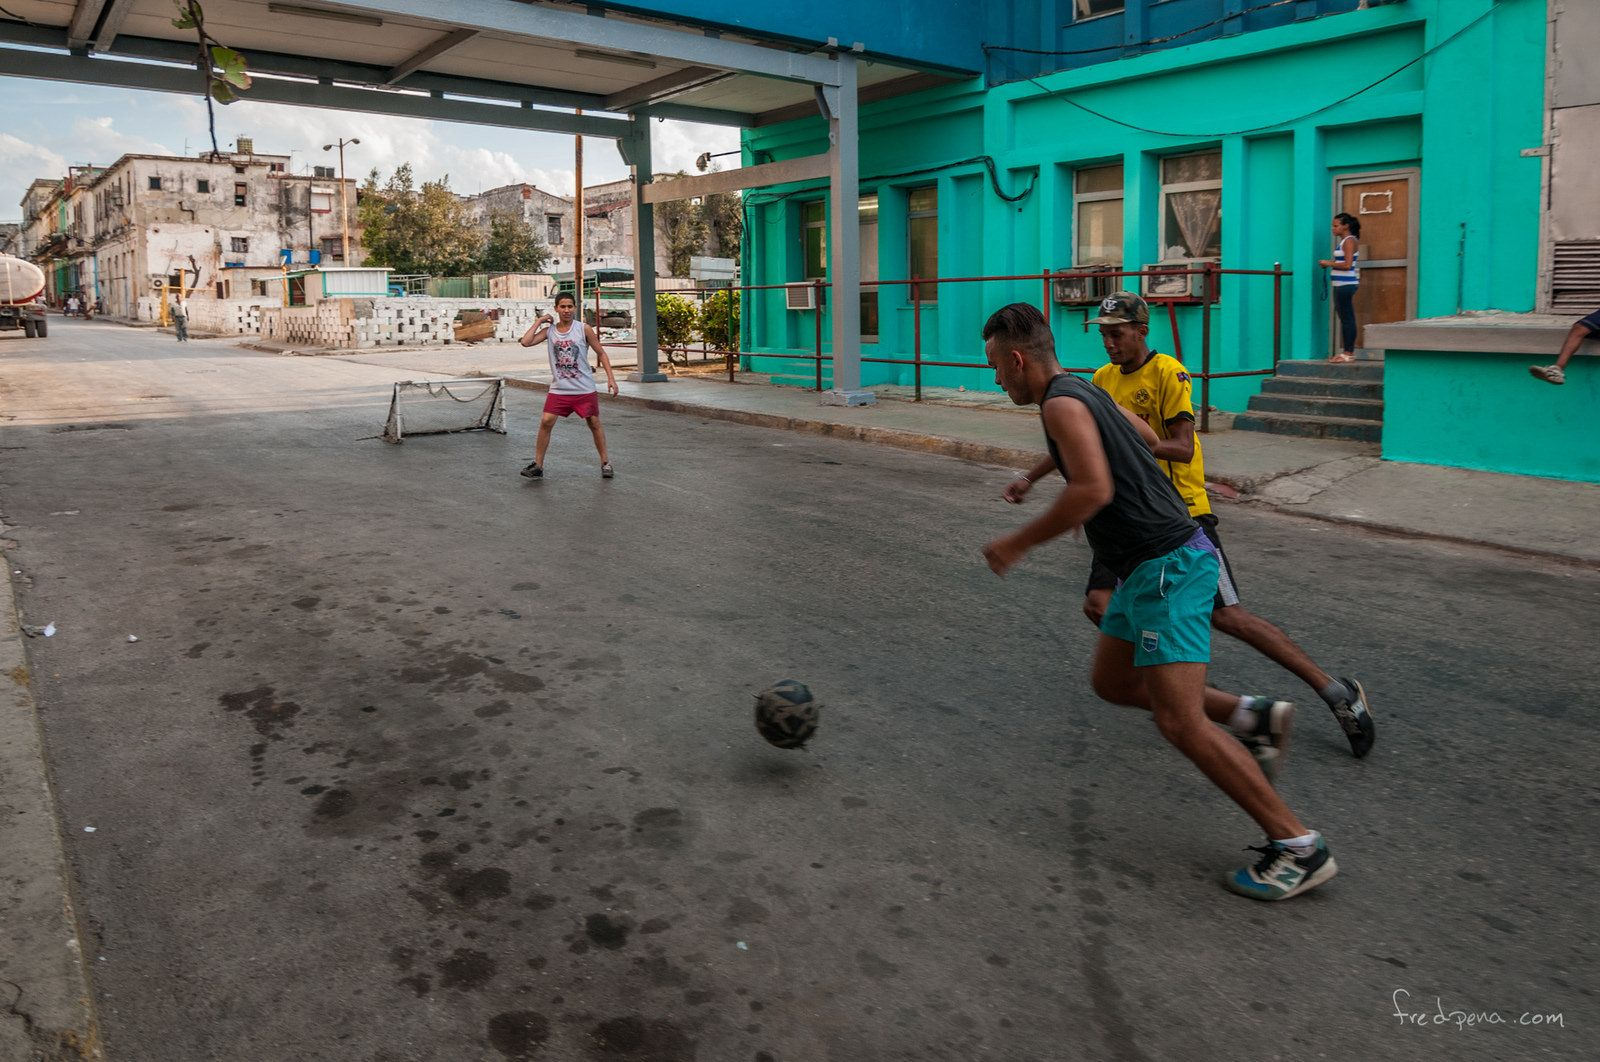 Fútbol callejero #comparte #comenta #like (Foto: alfredpenar / Flickr) https://www.facebook.com/CubanosGuru/